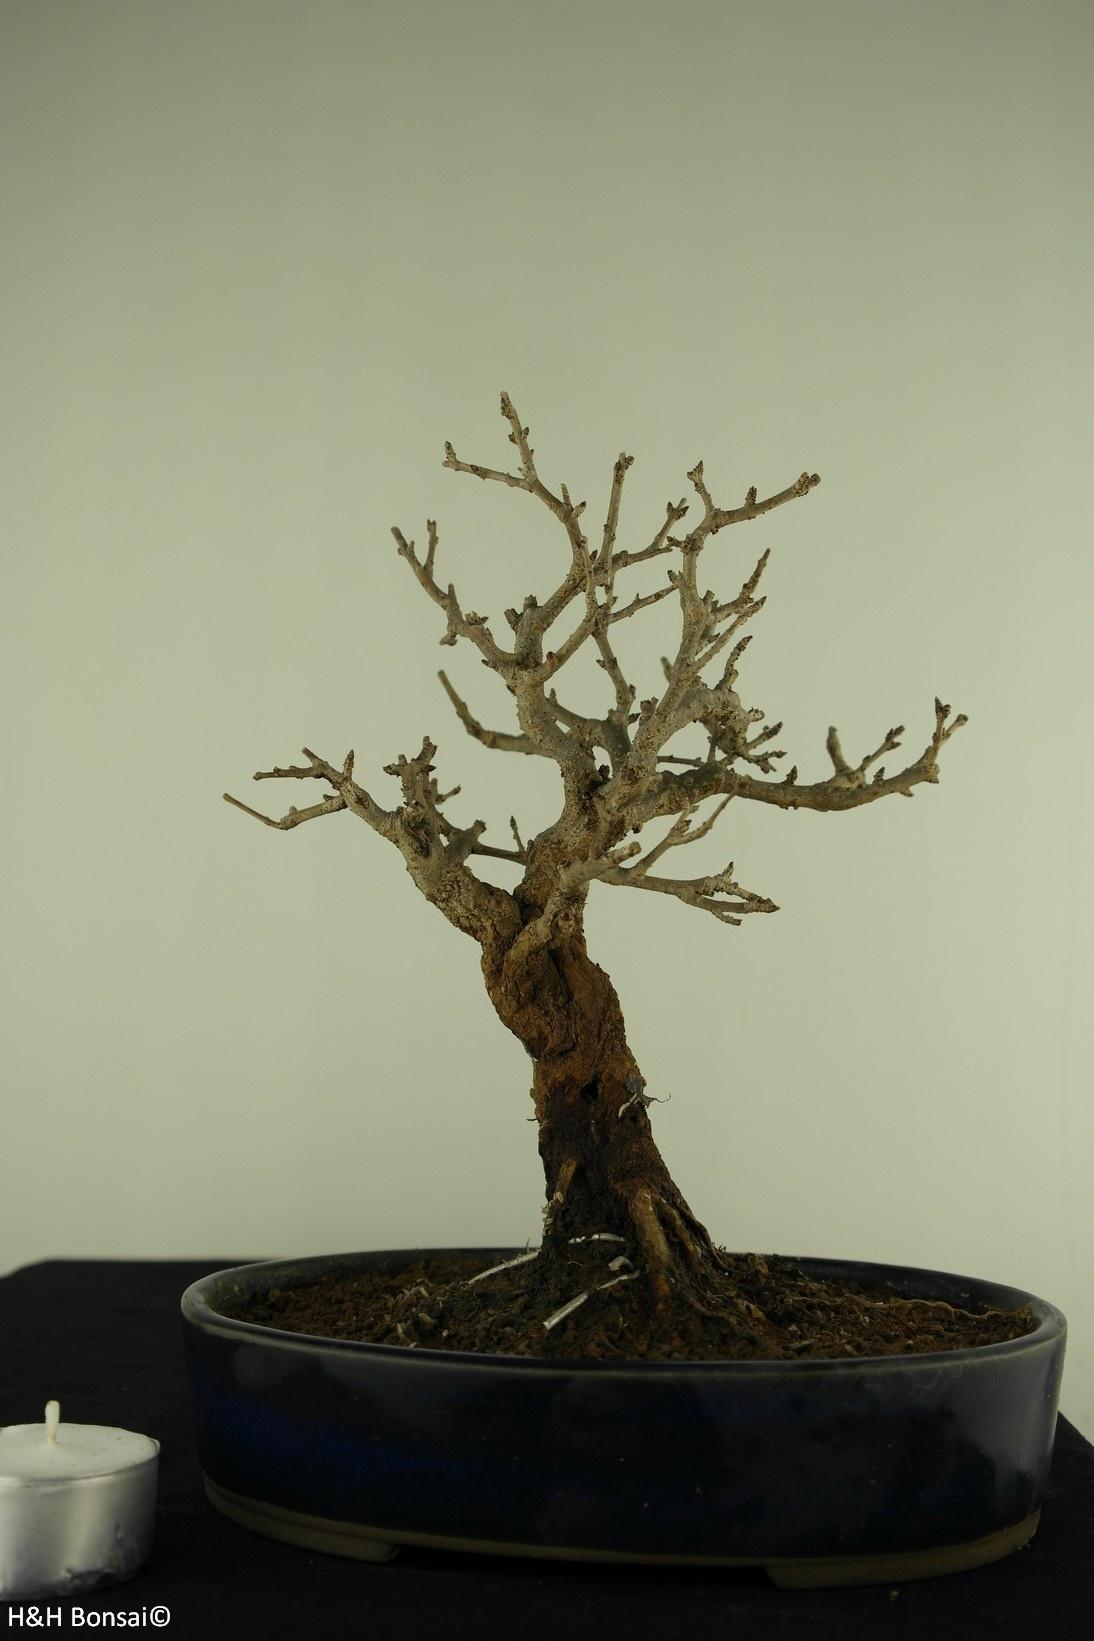 Bonsai Shohin Melograno, Punica granatum, no. 7770